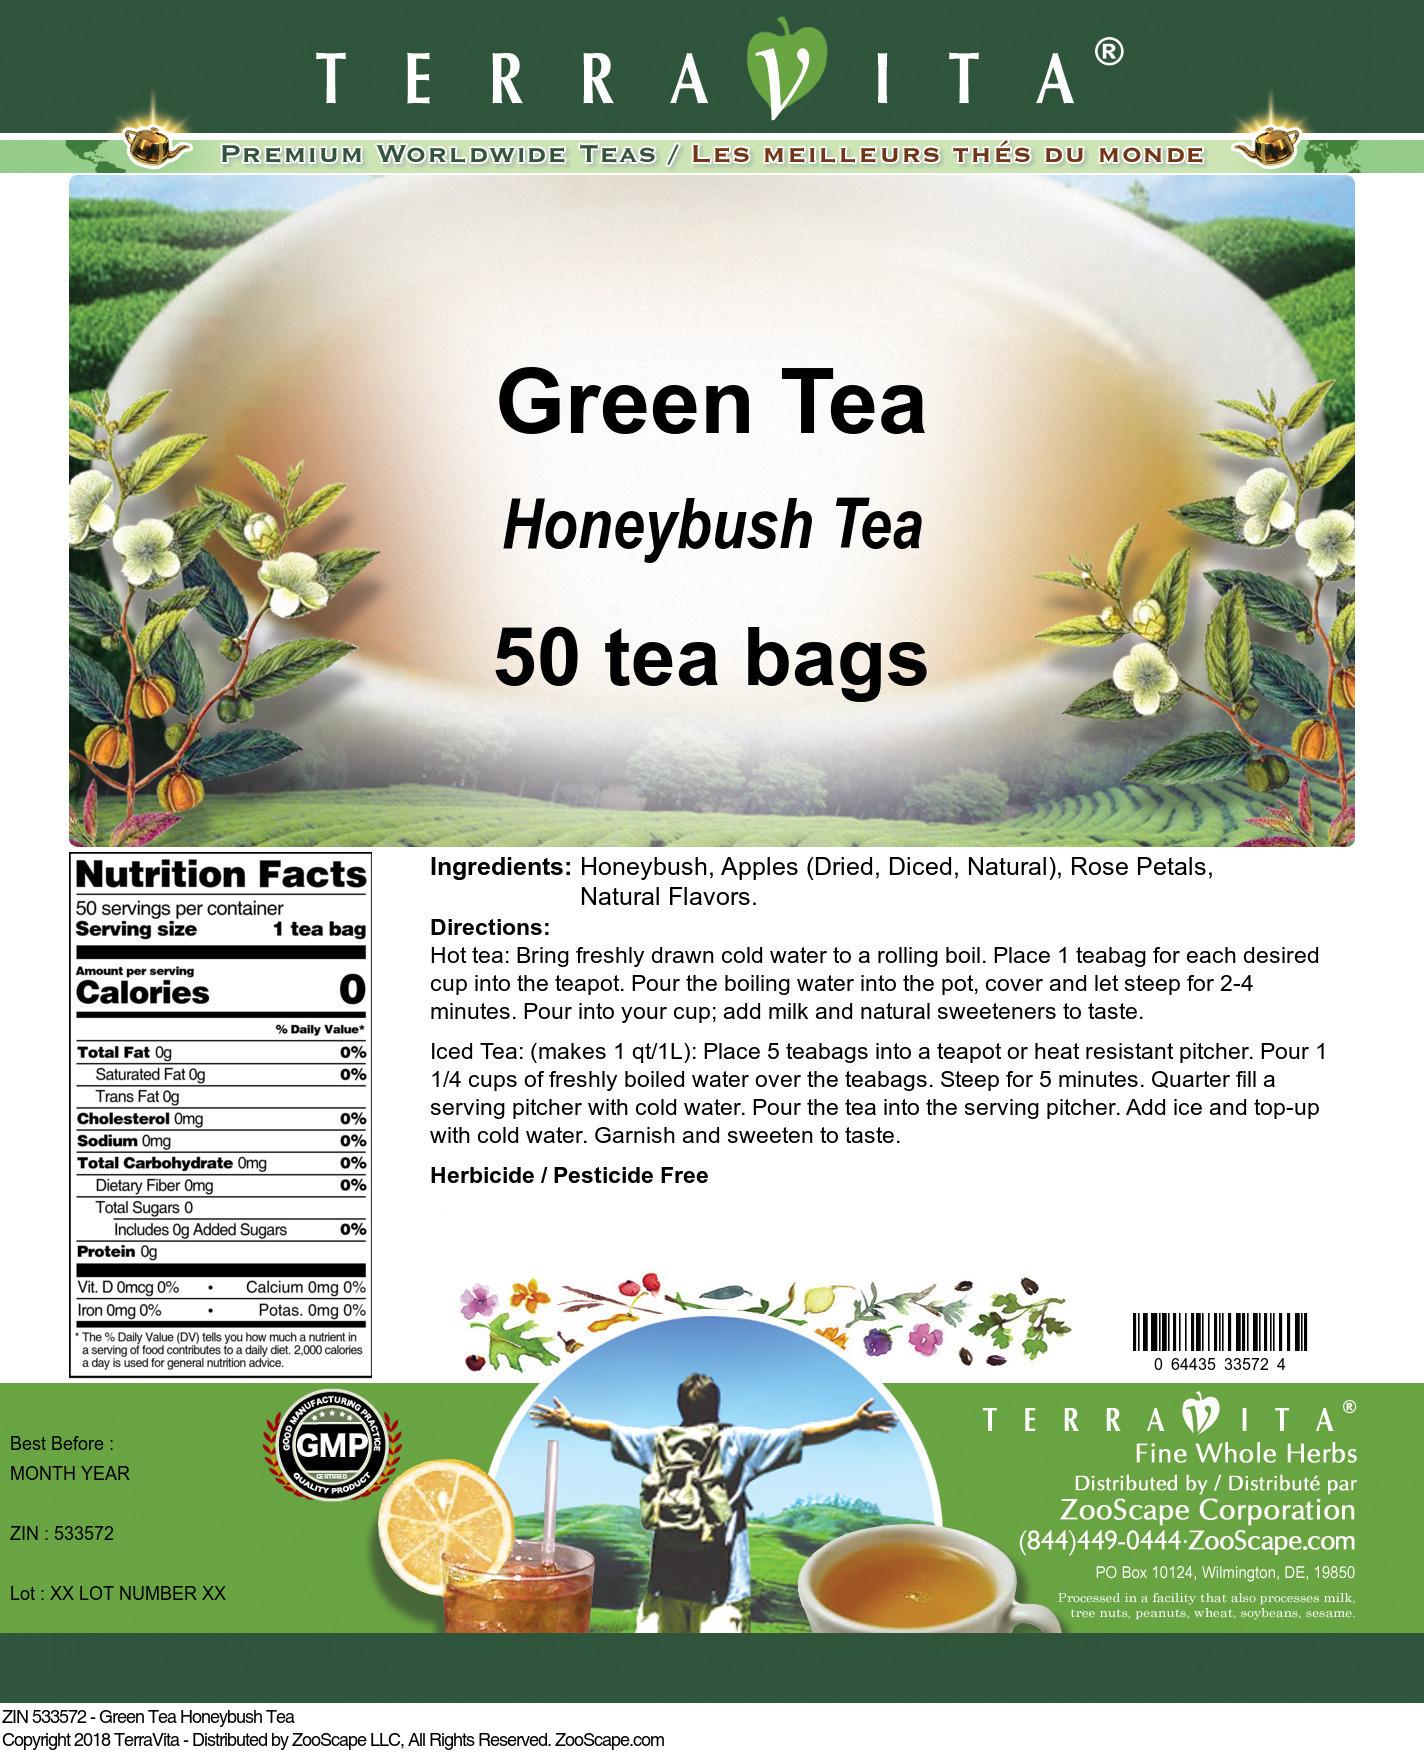 Green Tea Honeybush Tea